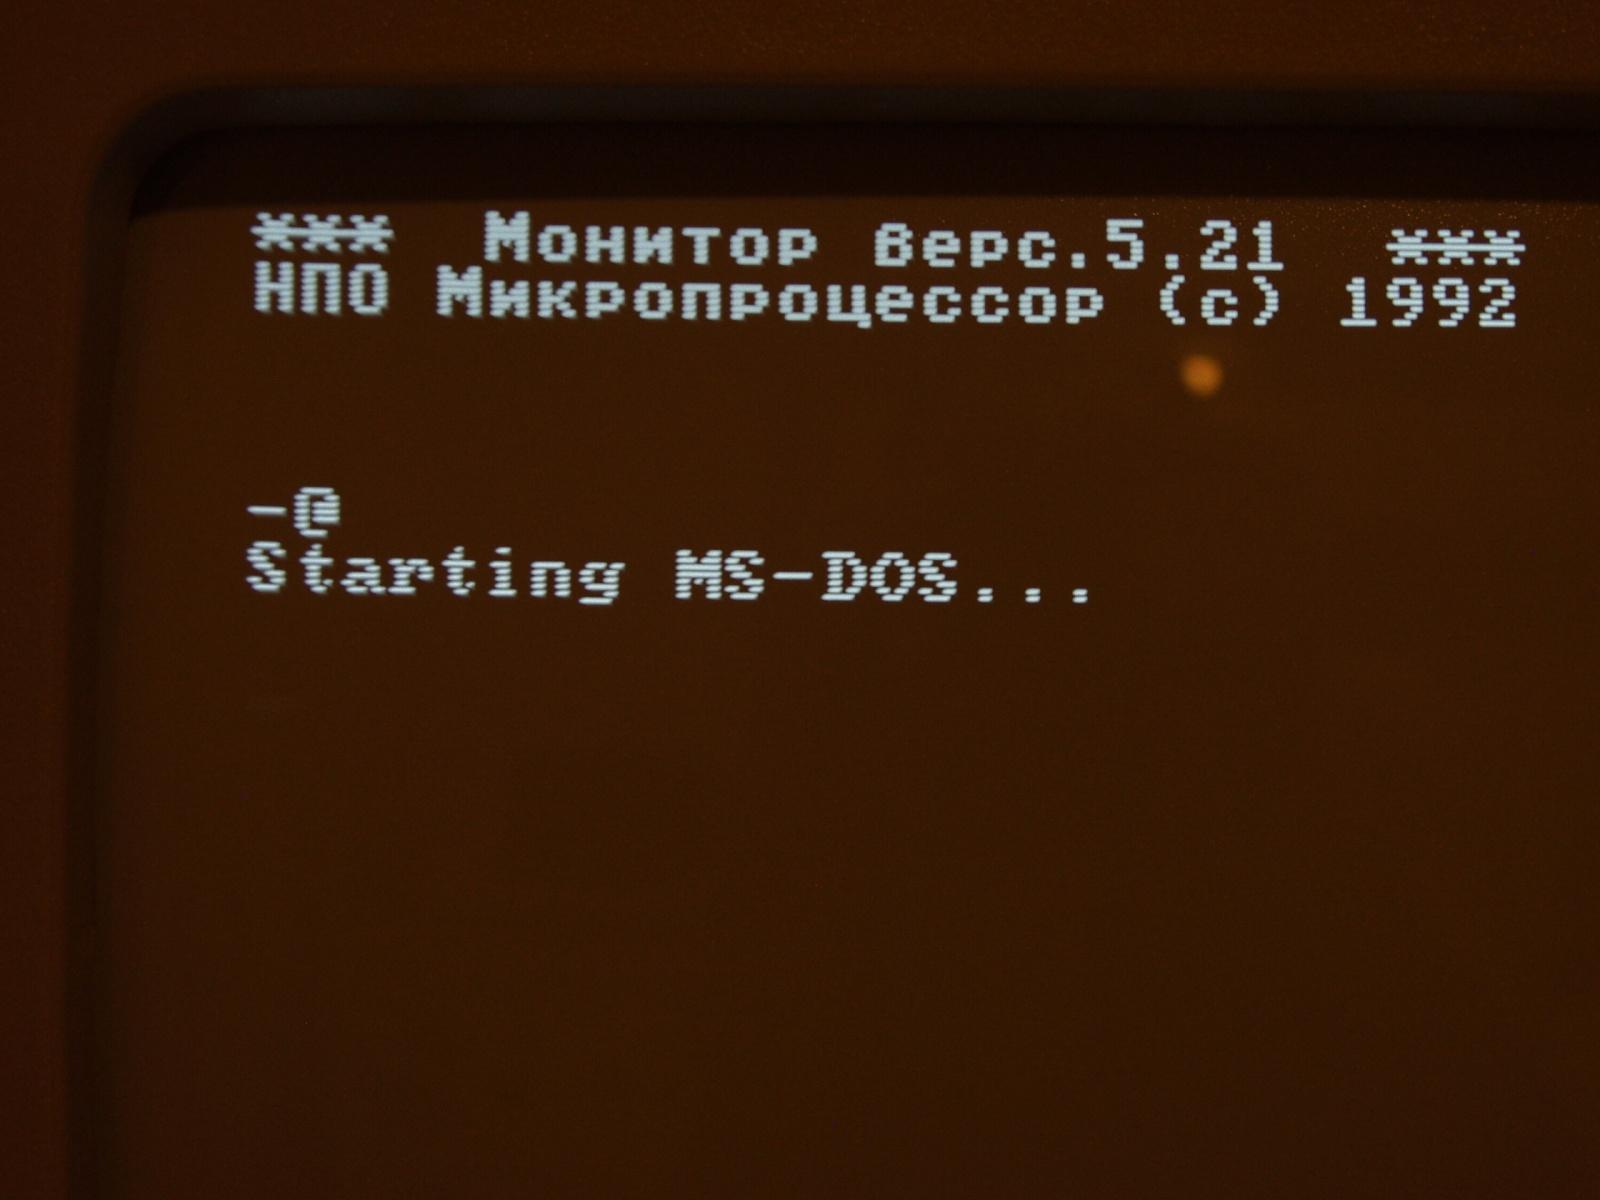 Советская IBM-PC Электроника МС-1502 - 20